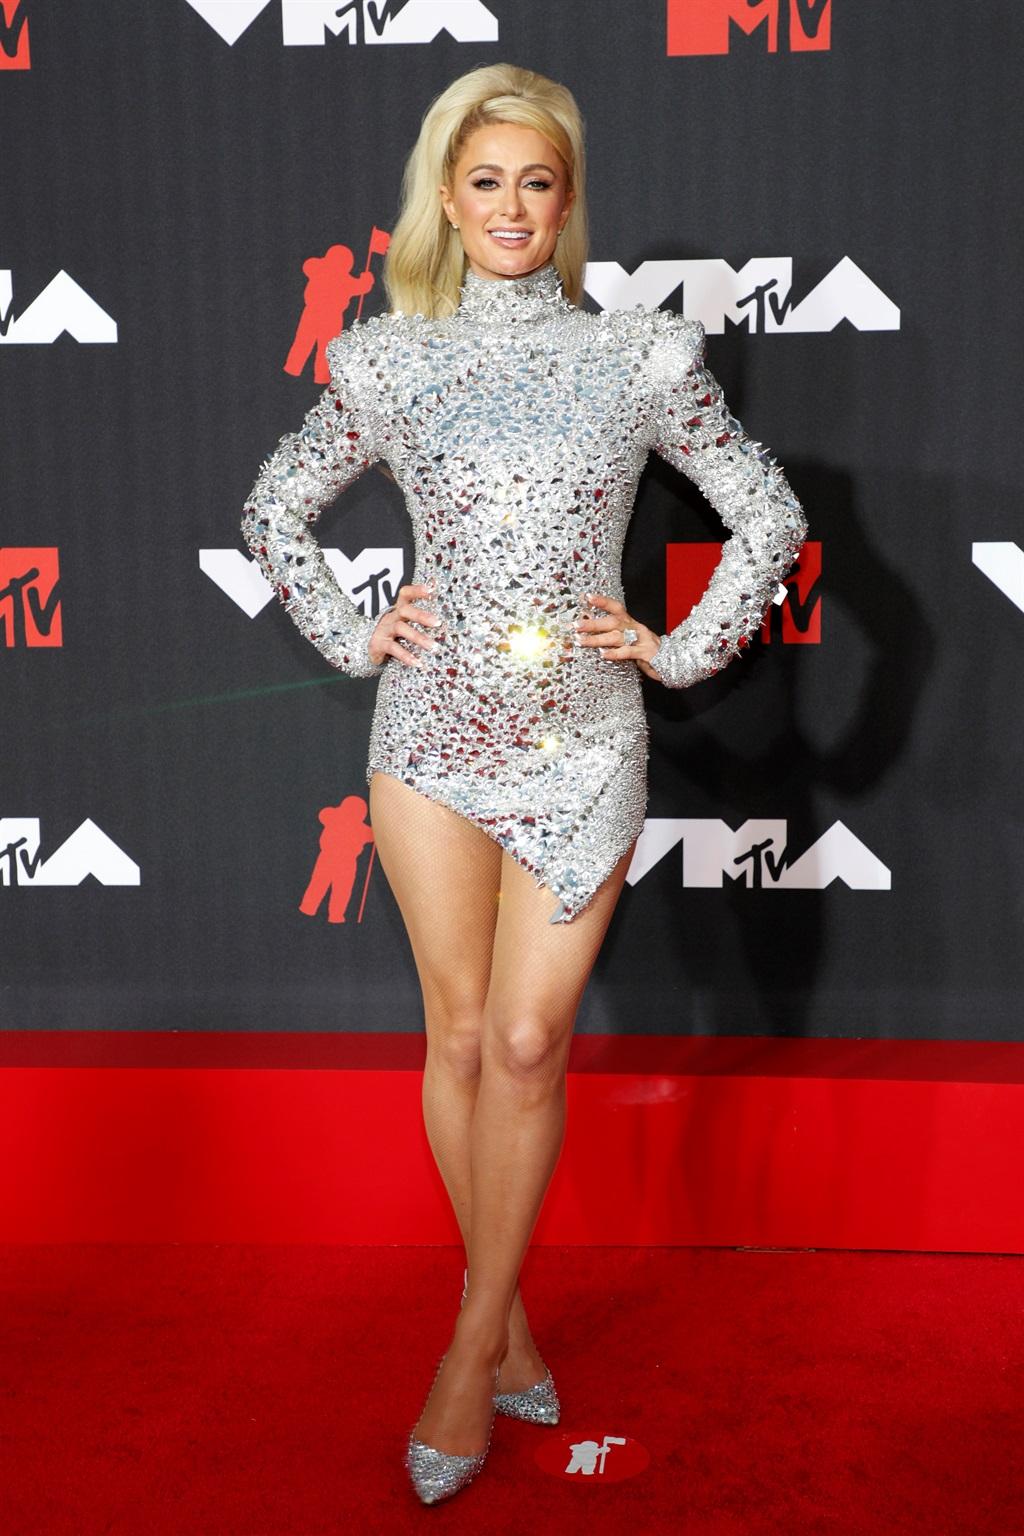 NEW YORK, NEW YORK - SEPTEMBER 12: Paris Hilton at